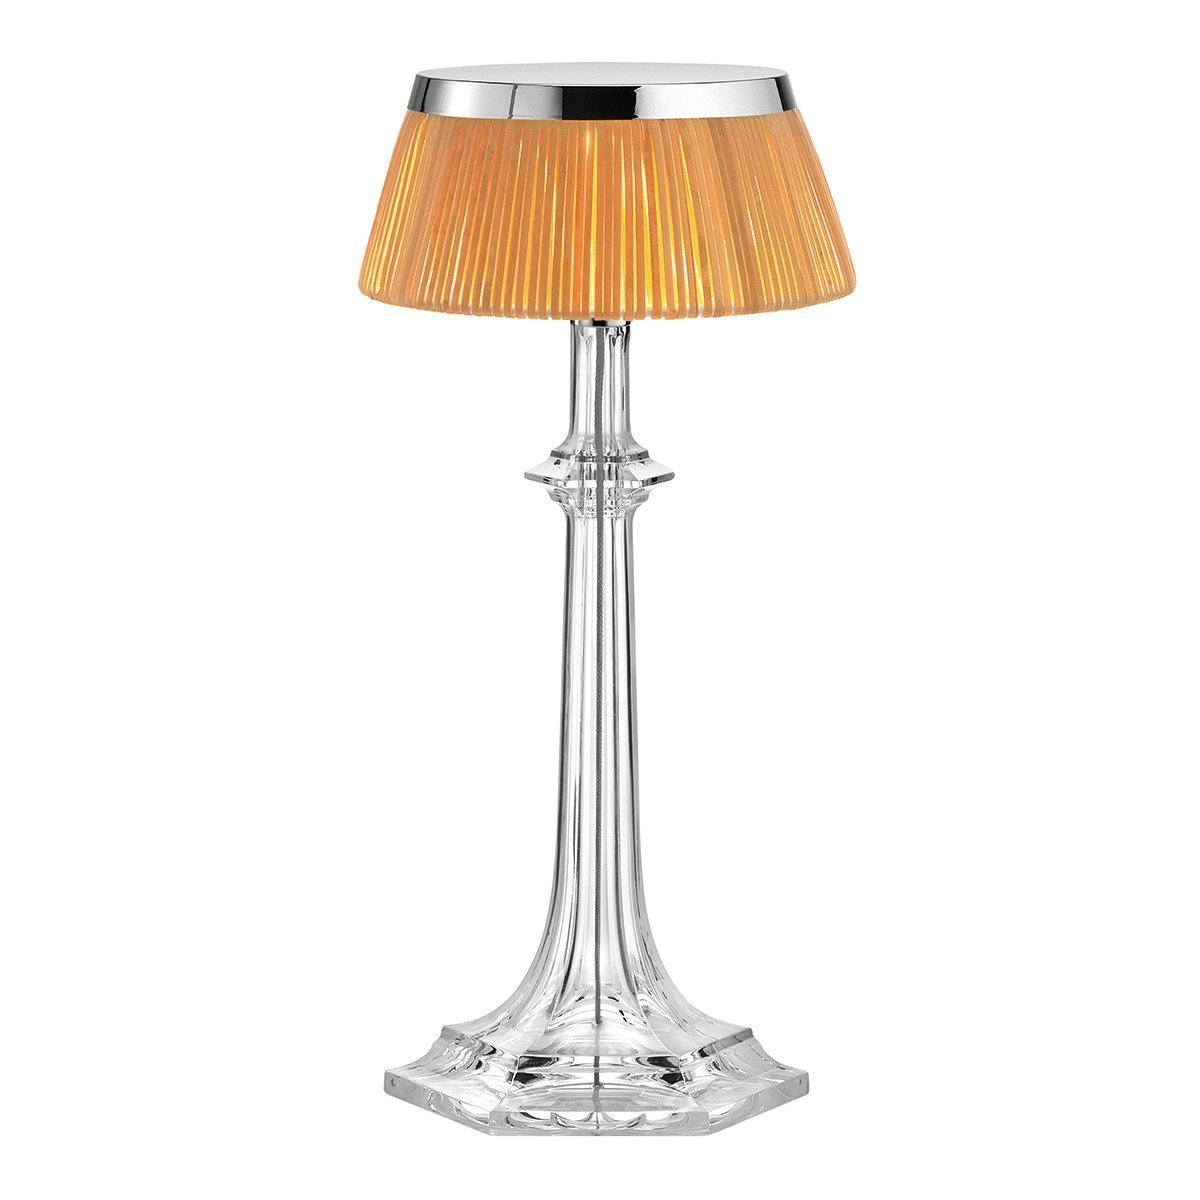 FLOS Bon Jour Versailles Small Tafellamp Chroom - Rotan